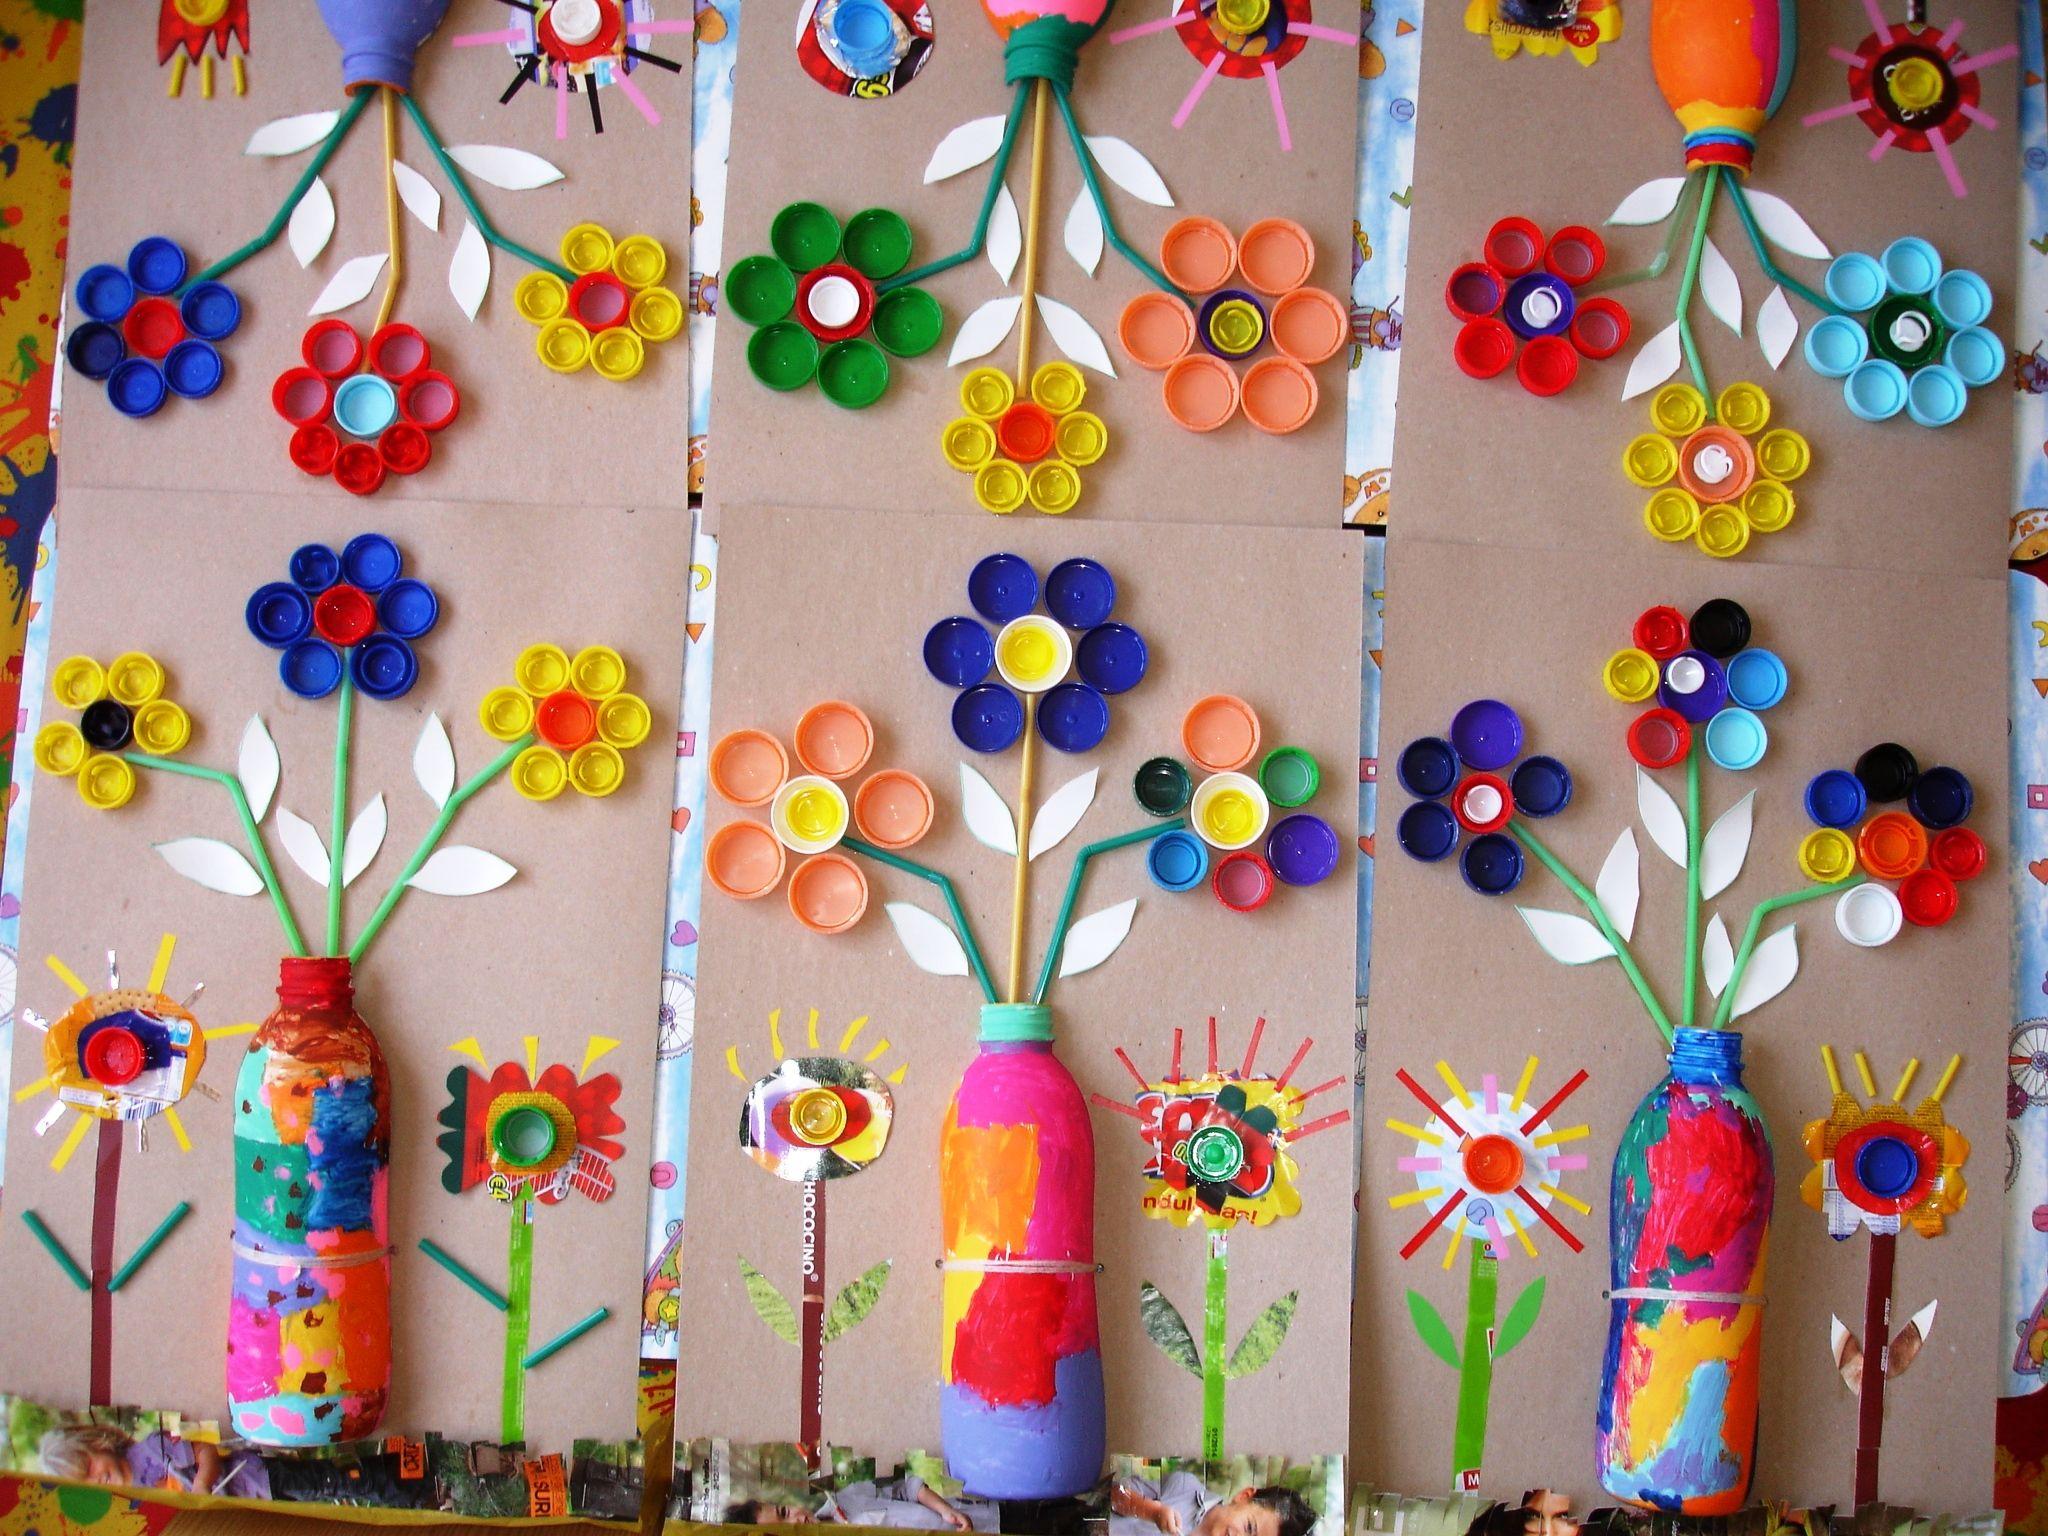 Crafts Ideas With Bottle Caps Flower Crafts Crafts Crafts For Kids